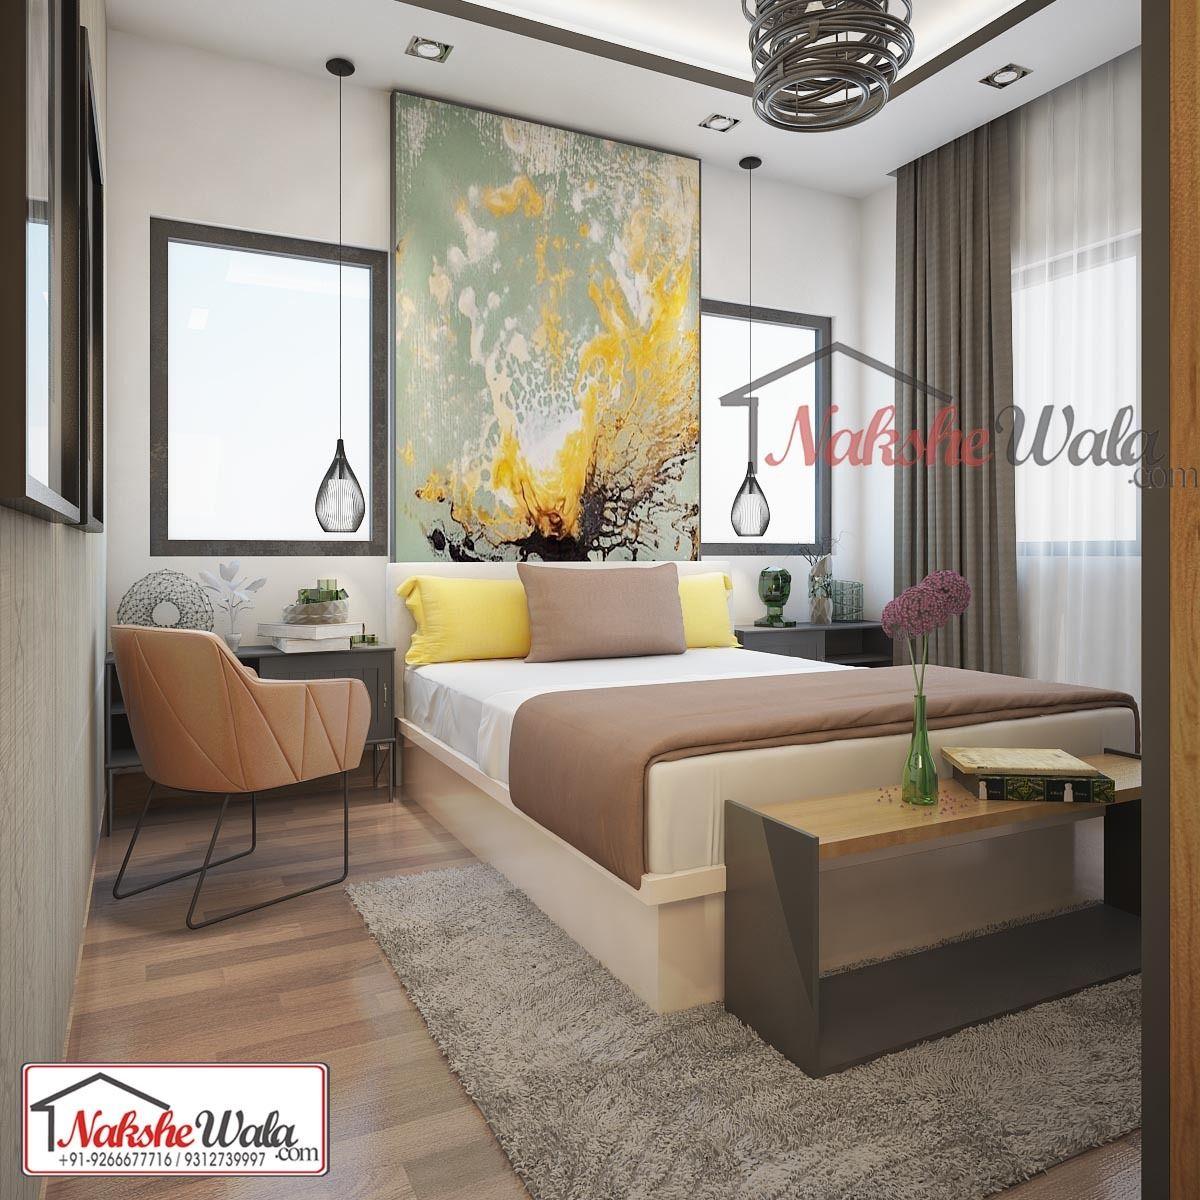 Simple Bed Room Interior Design By Nakshewala Interior Design Bedroom Interior Design Simple Bed